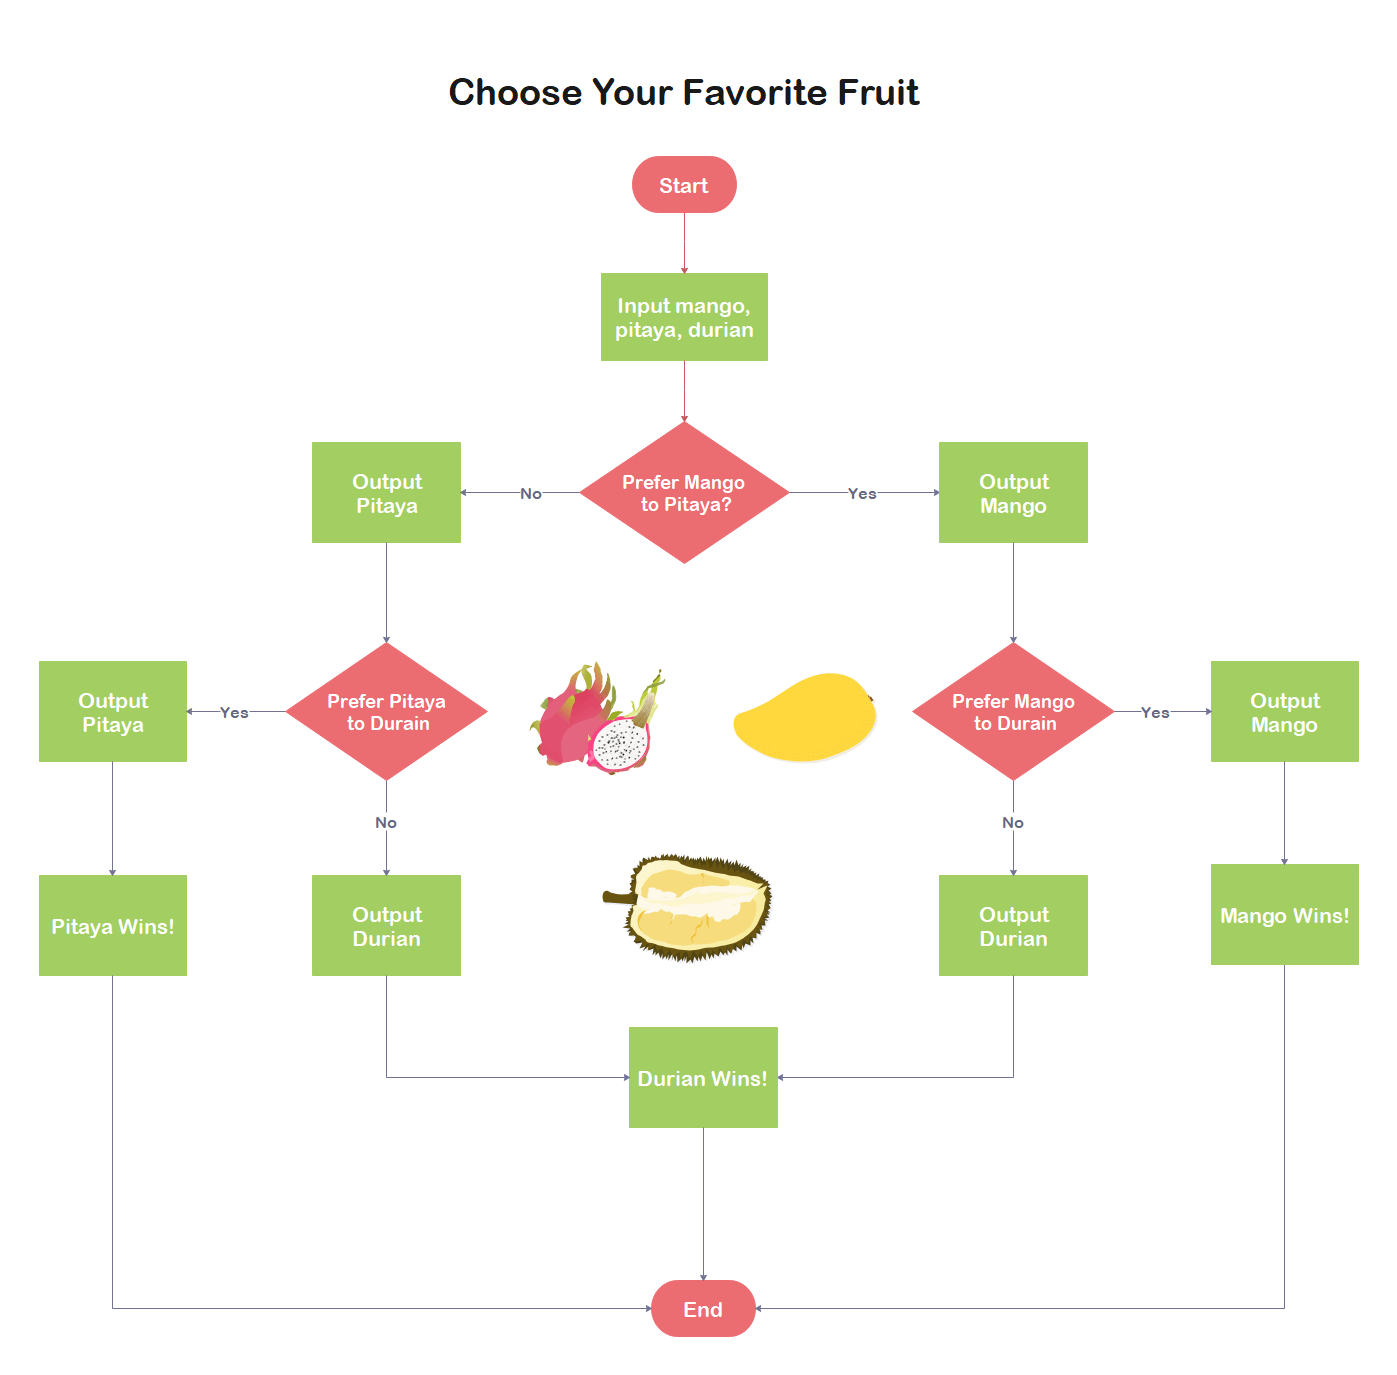 Choose a Favorite Fruit Flowchart